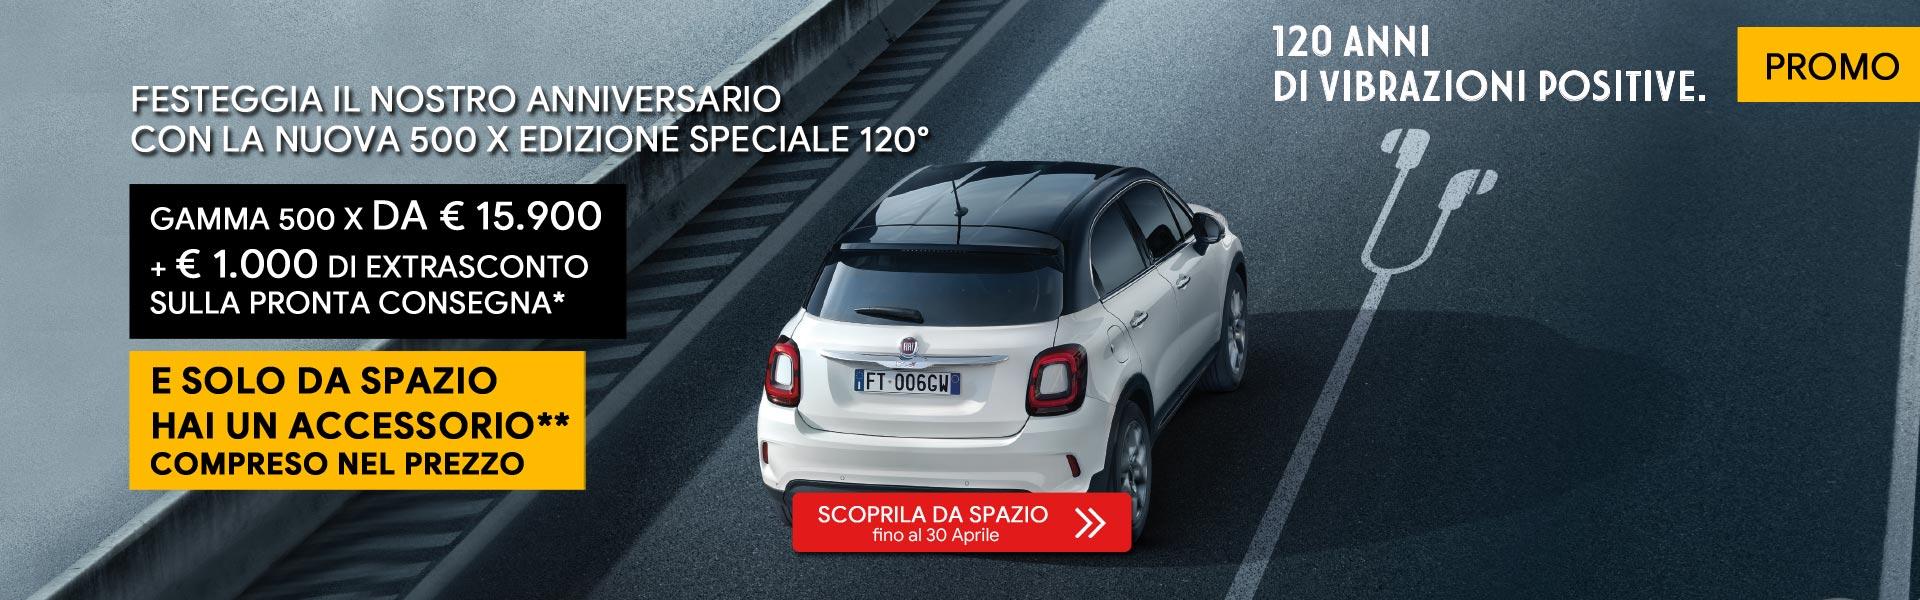 Fiat 500x Promo